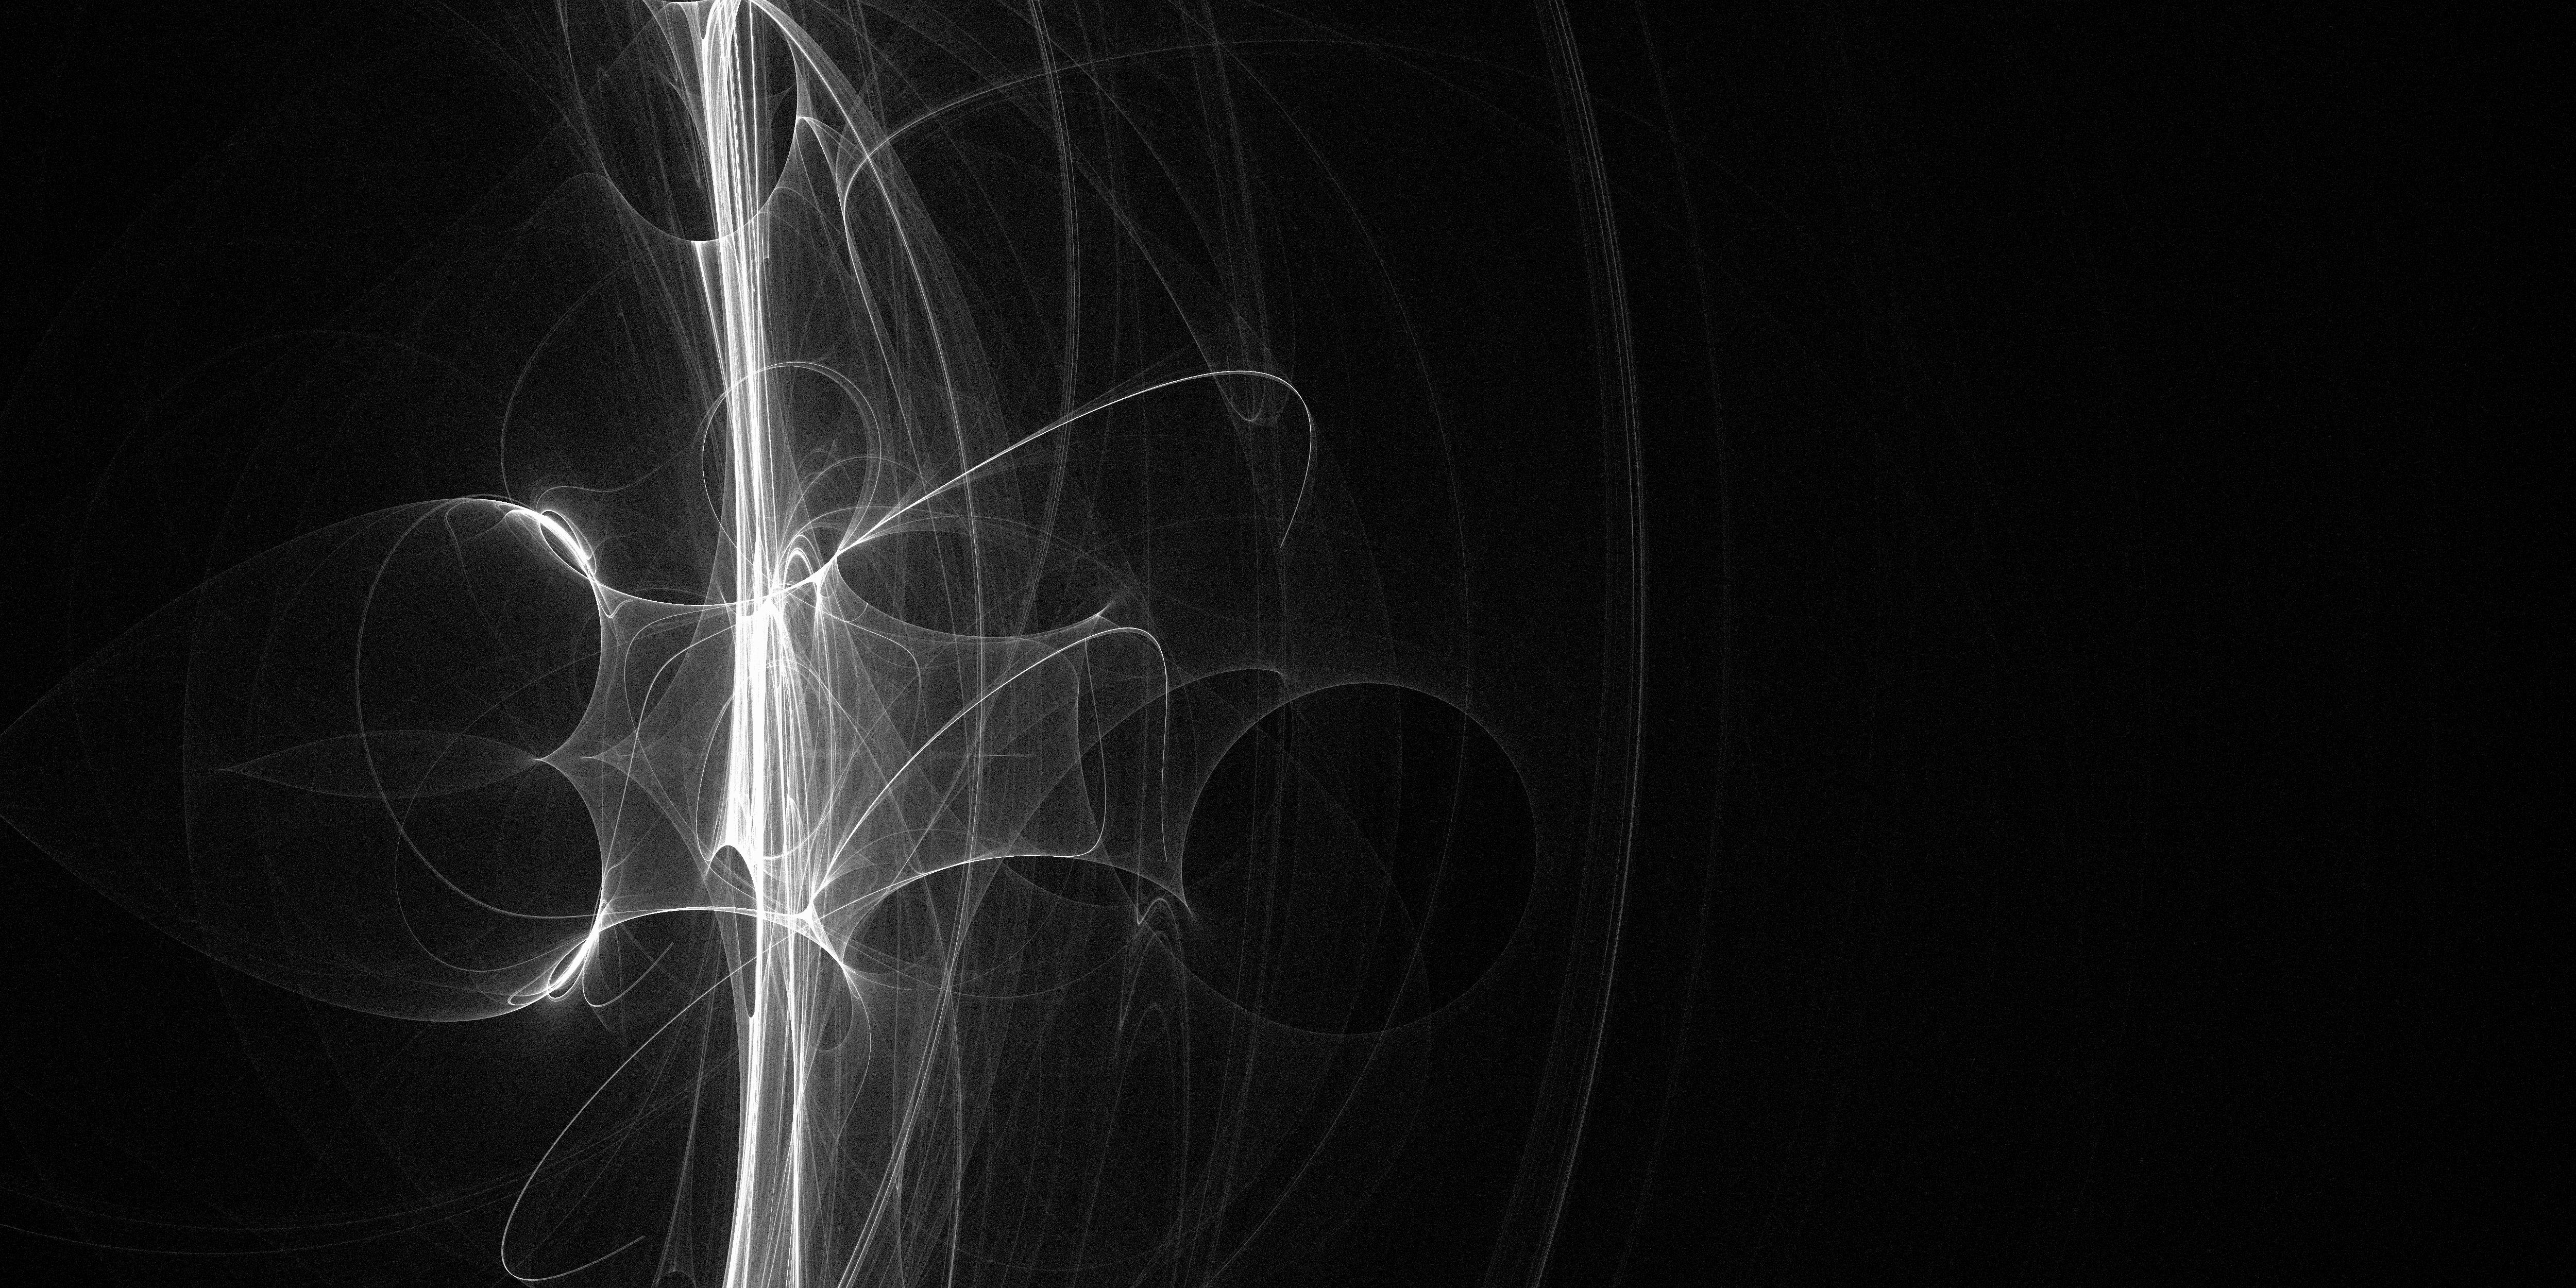 Abstract fractal art wallpaper photo